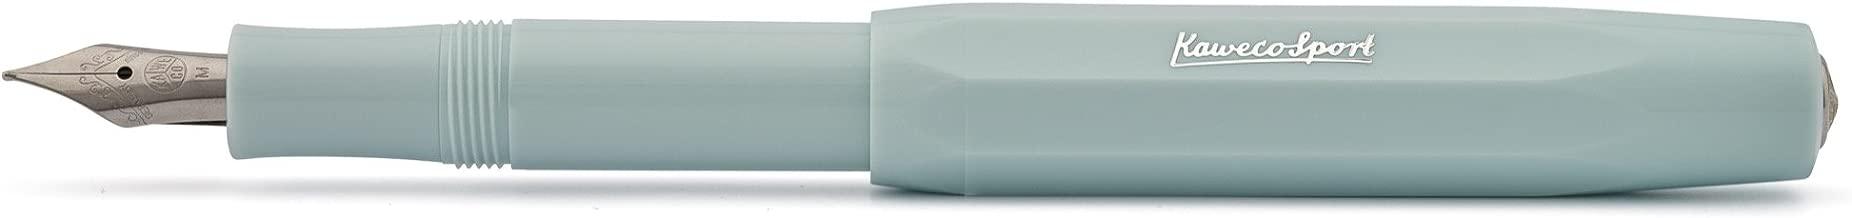 Kaweco Sport Skyline Fountain Pen mint M (medium) Nib